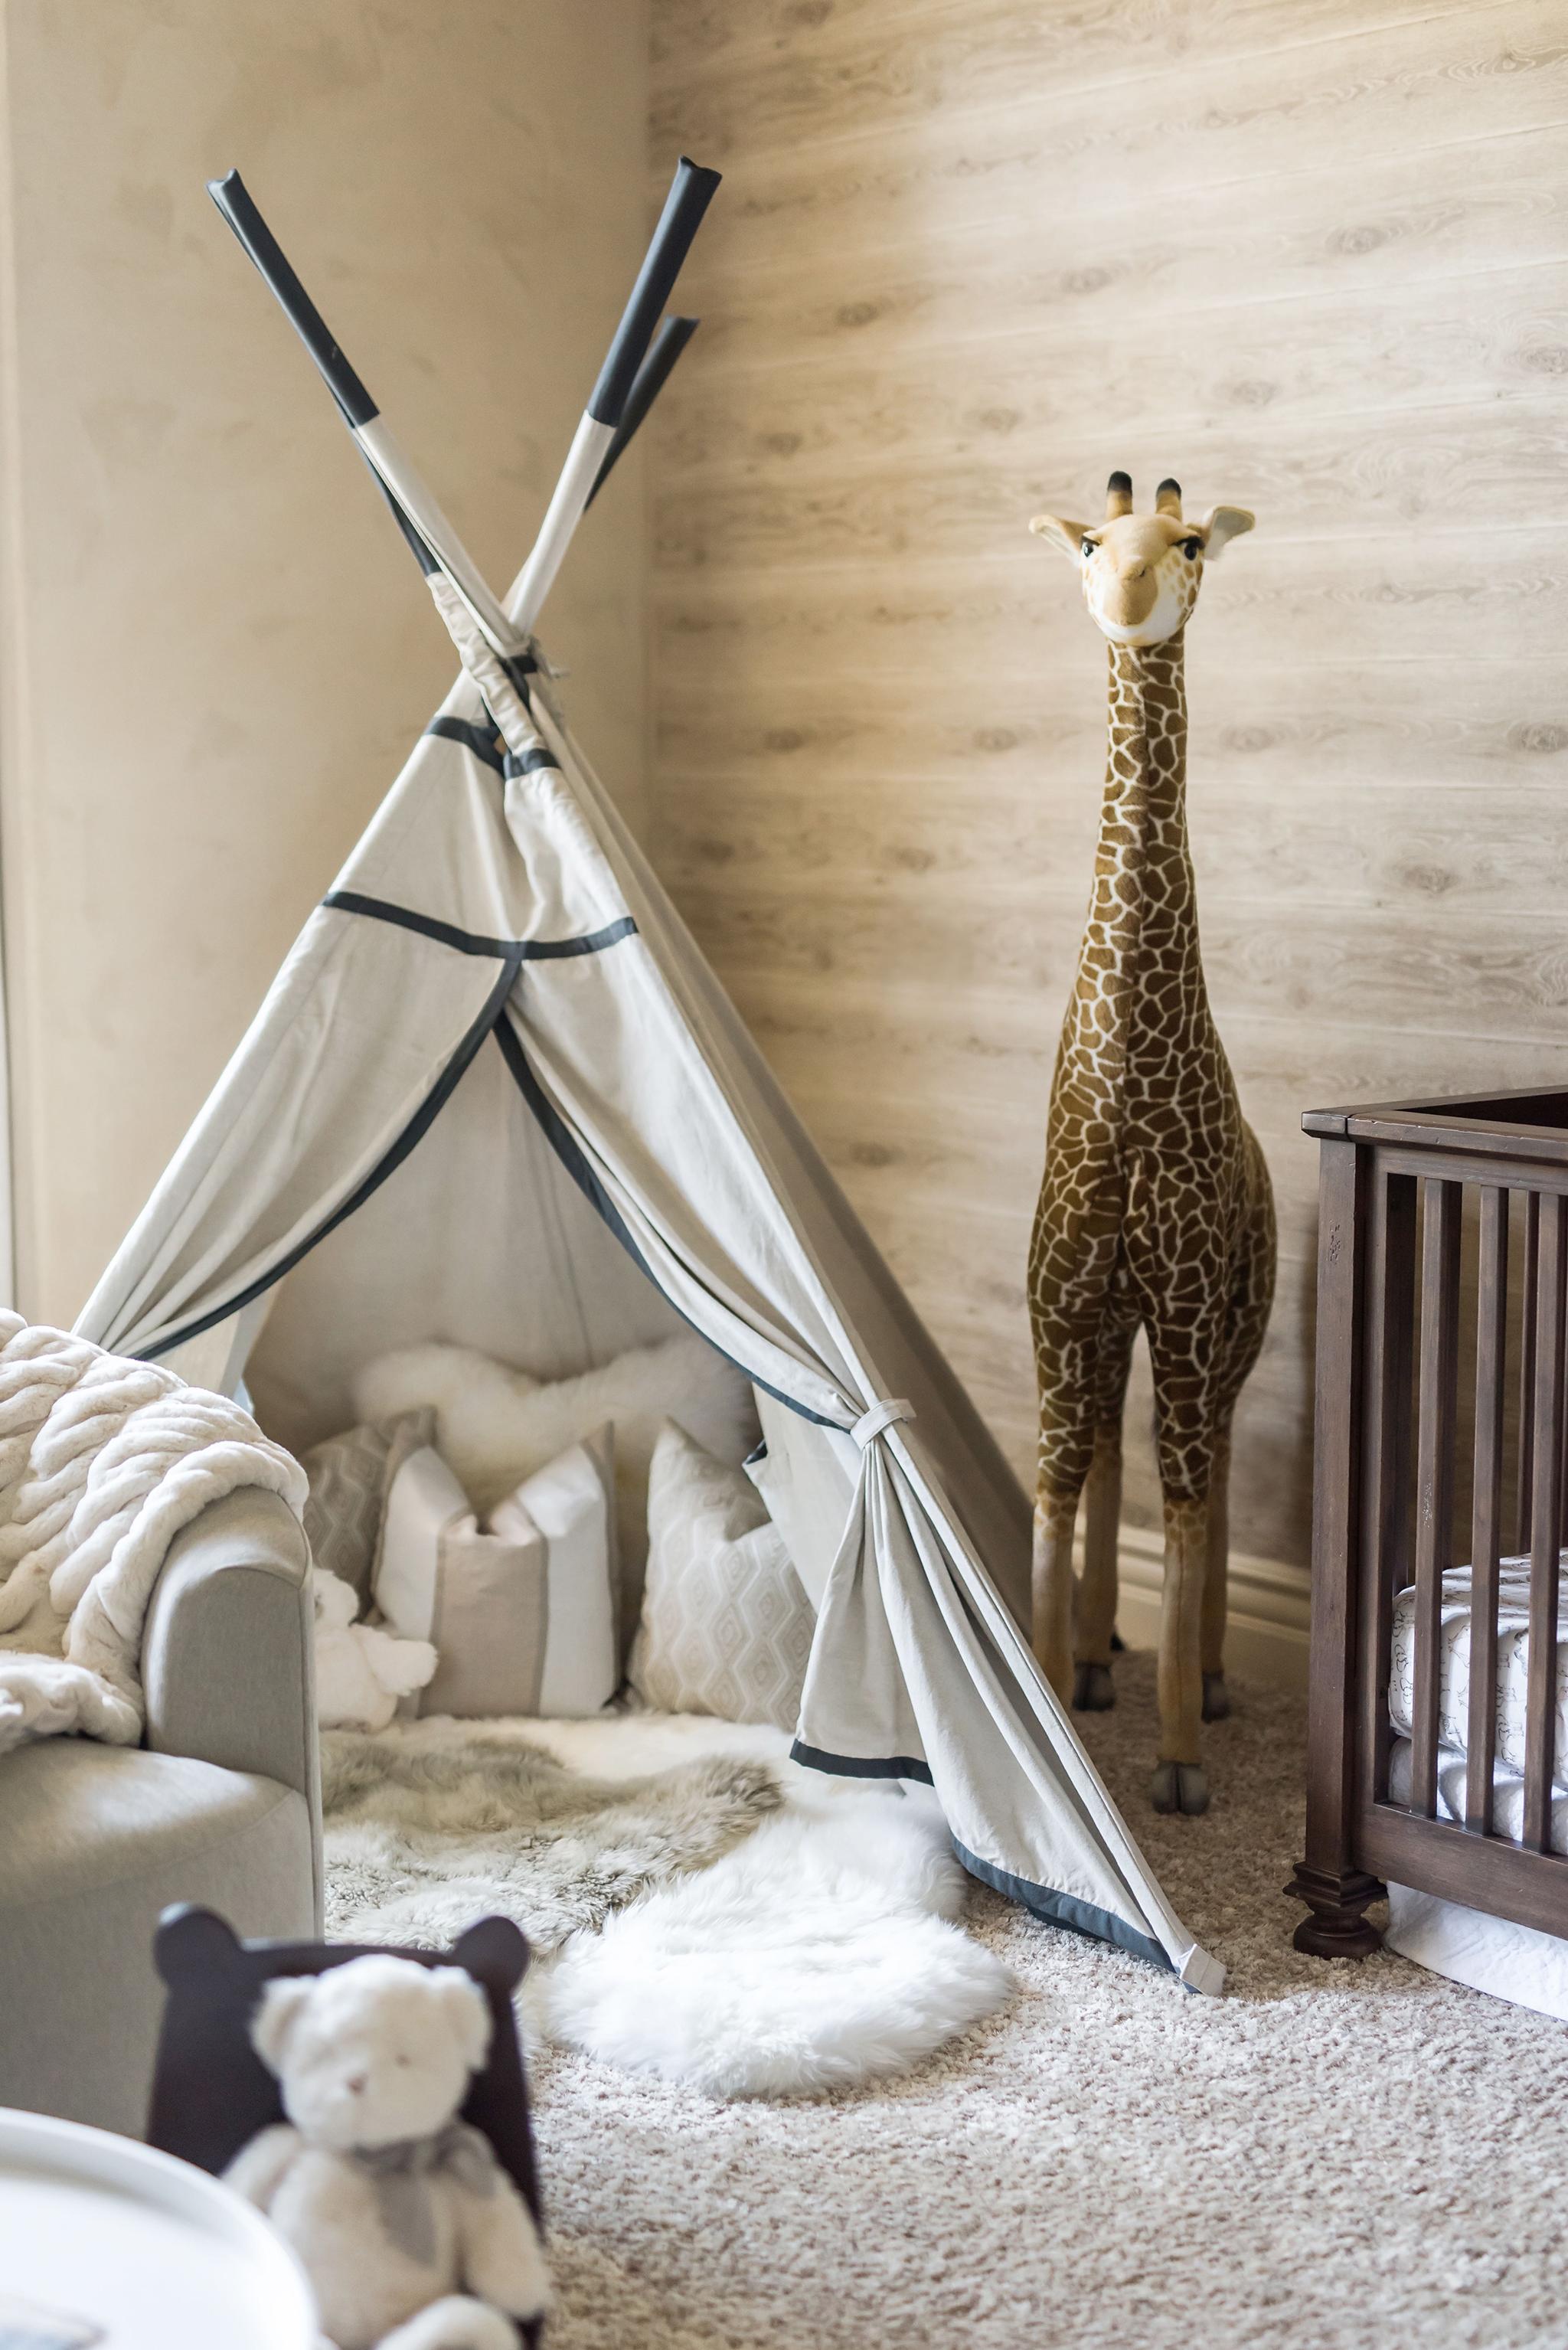 Safari Nursery with Teepee and Large Giraffe